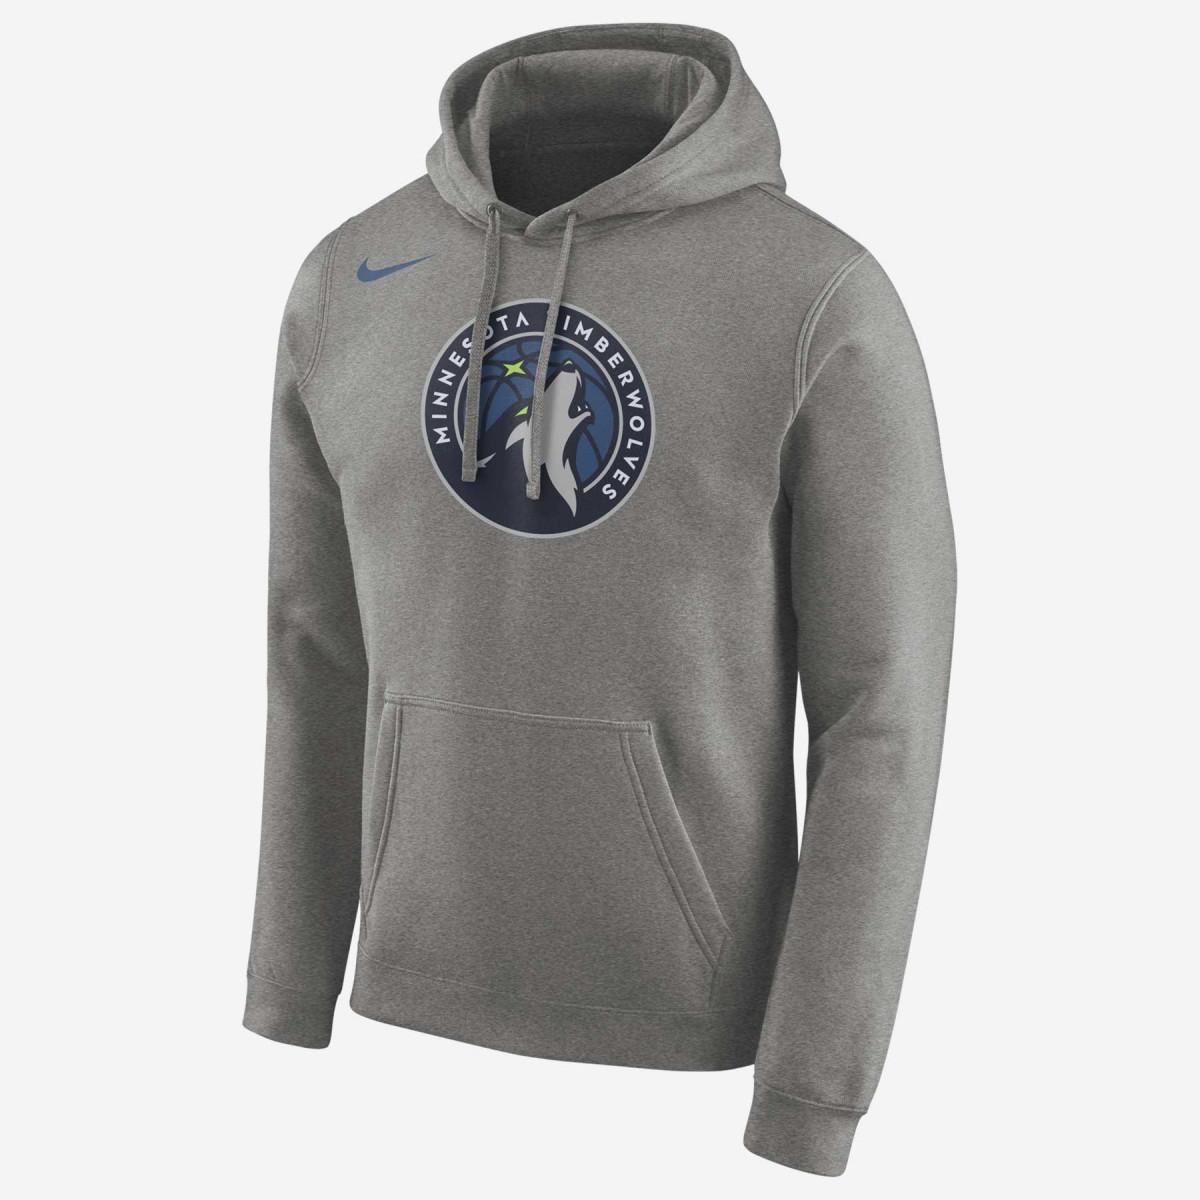 new arrival 0705f 9cf45 Nike NBA Minnesota Timberwolves Hoodie - NBA Shop Minnesota ...